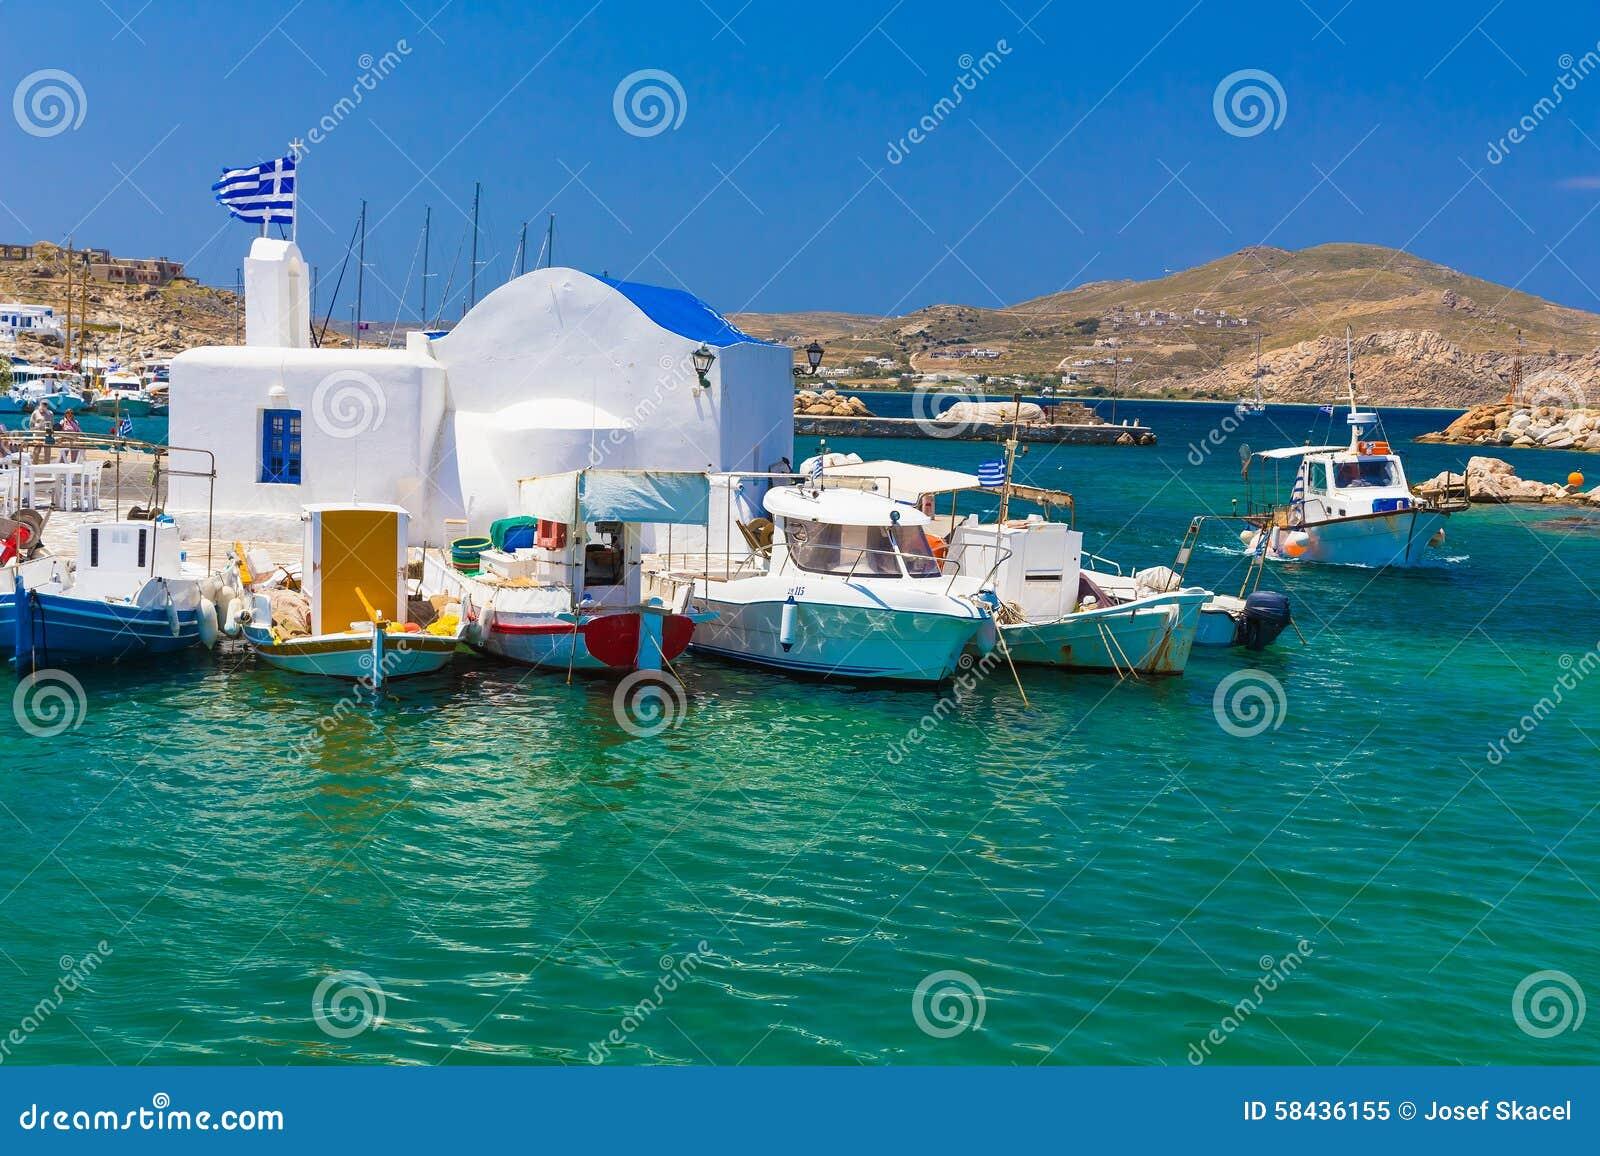 Naoussa town, Paros island, Cyclades, Aegean, Greece